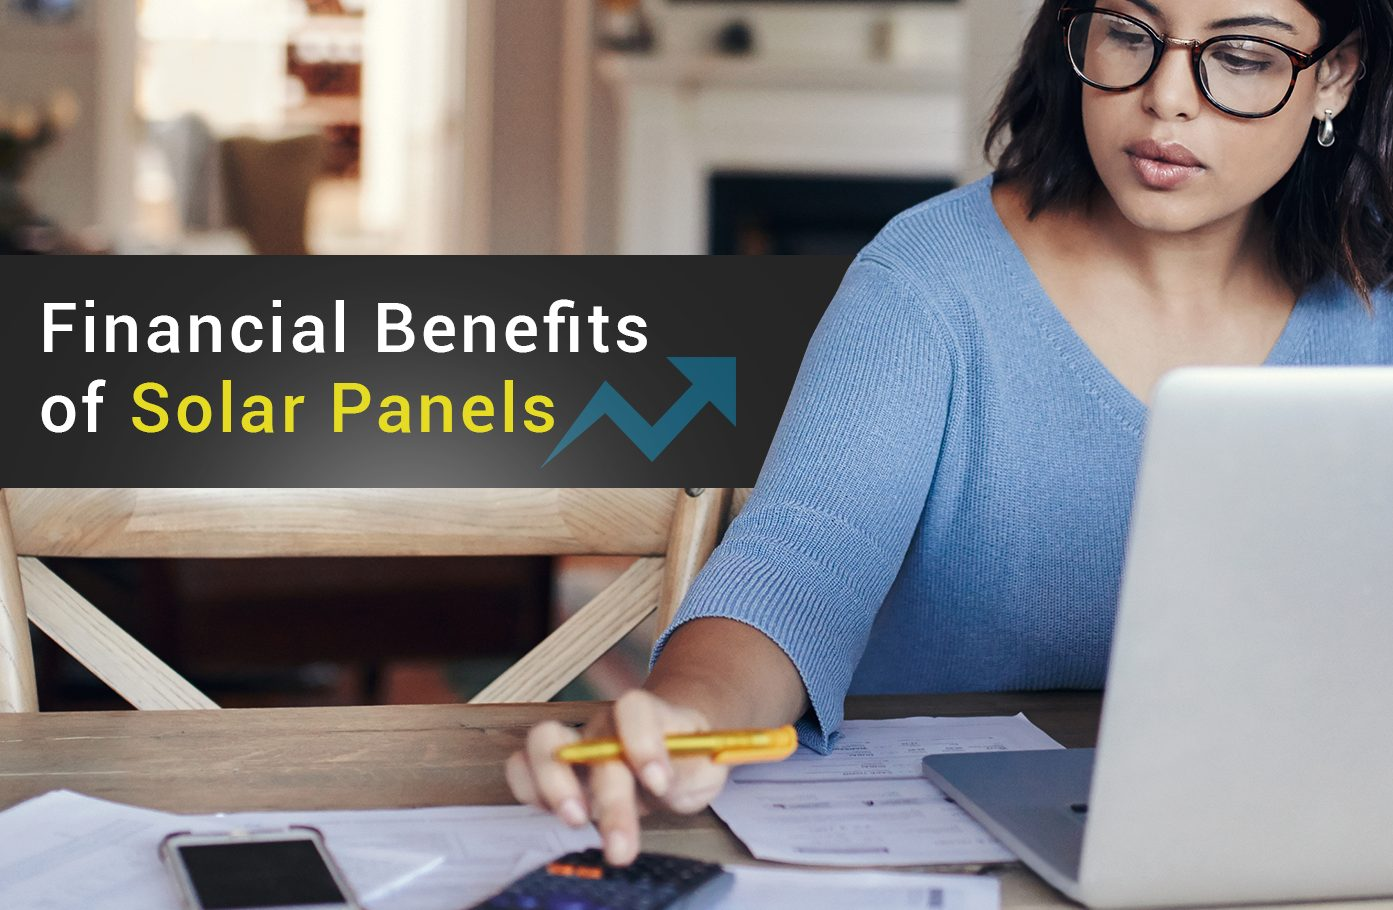 5 Financial Benefits of Solar Panels